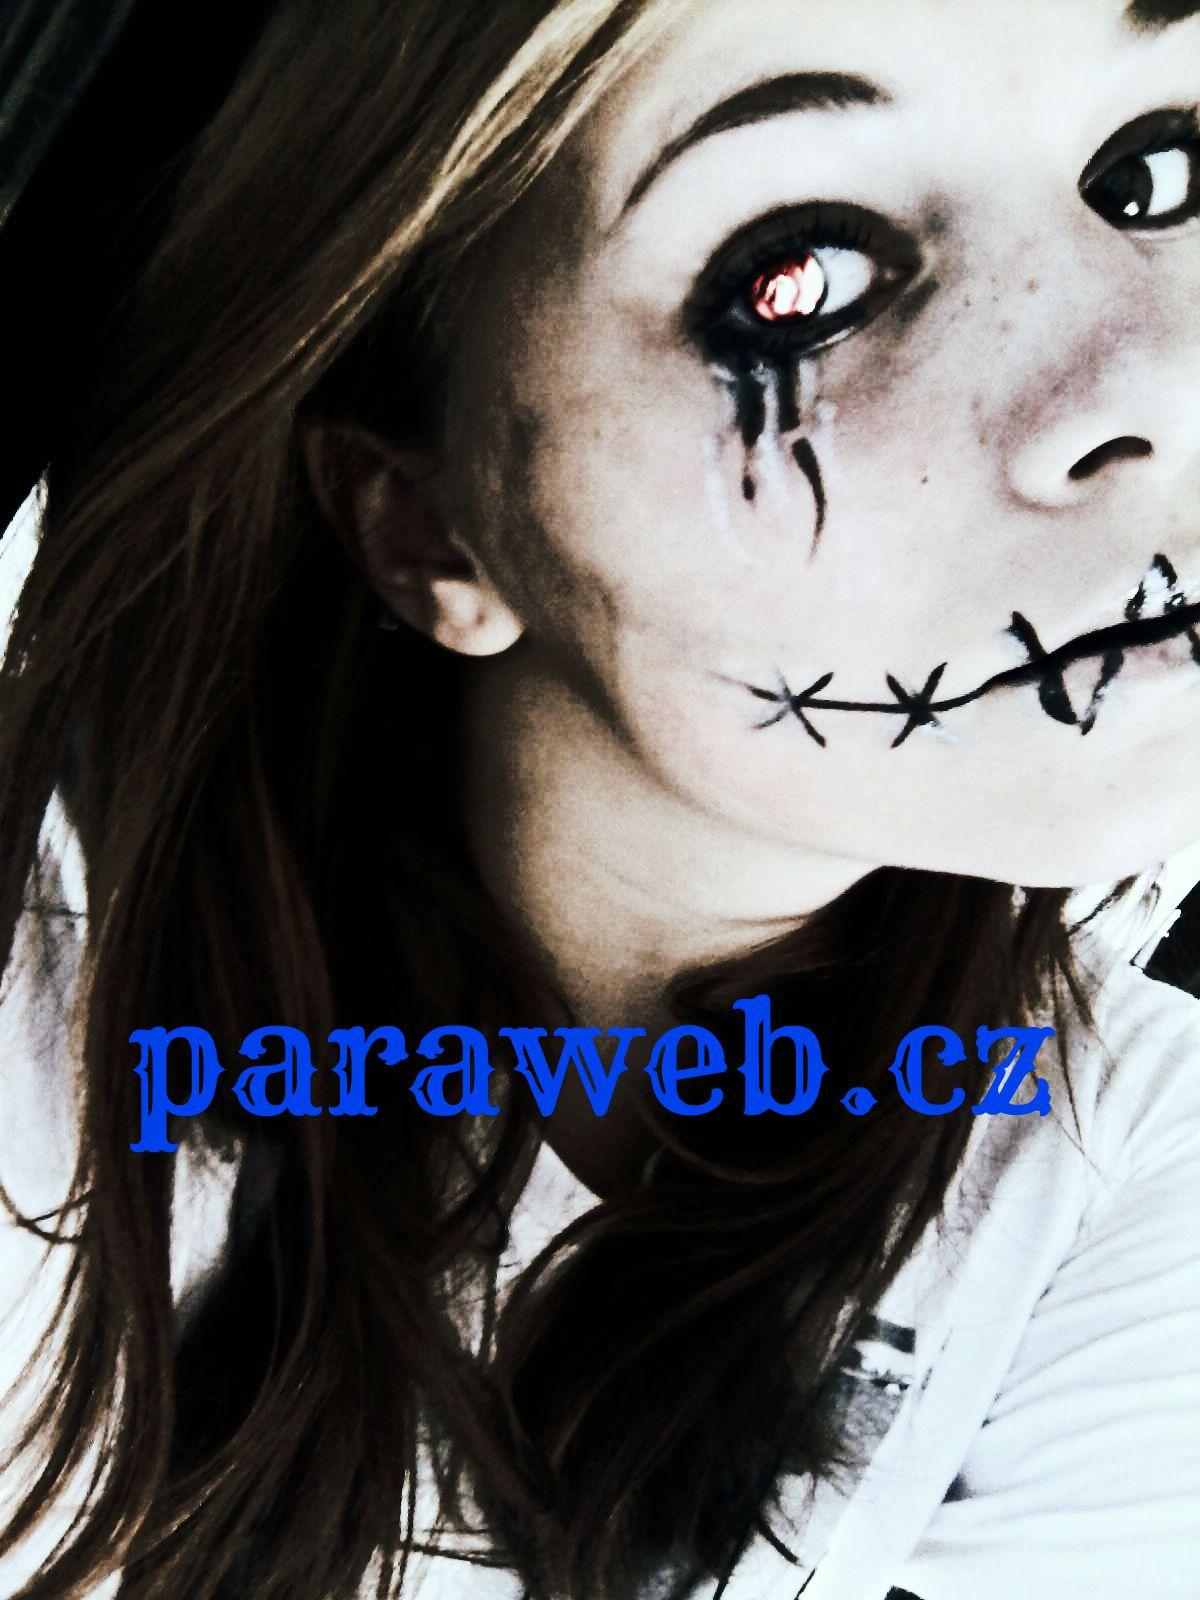 paraweb.cz